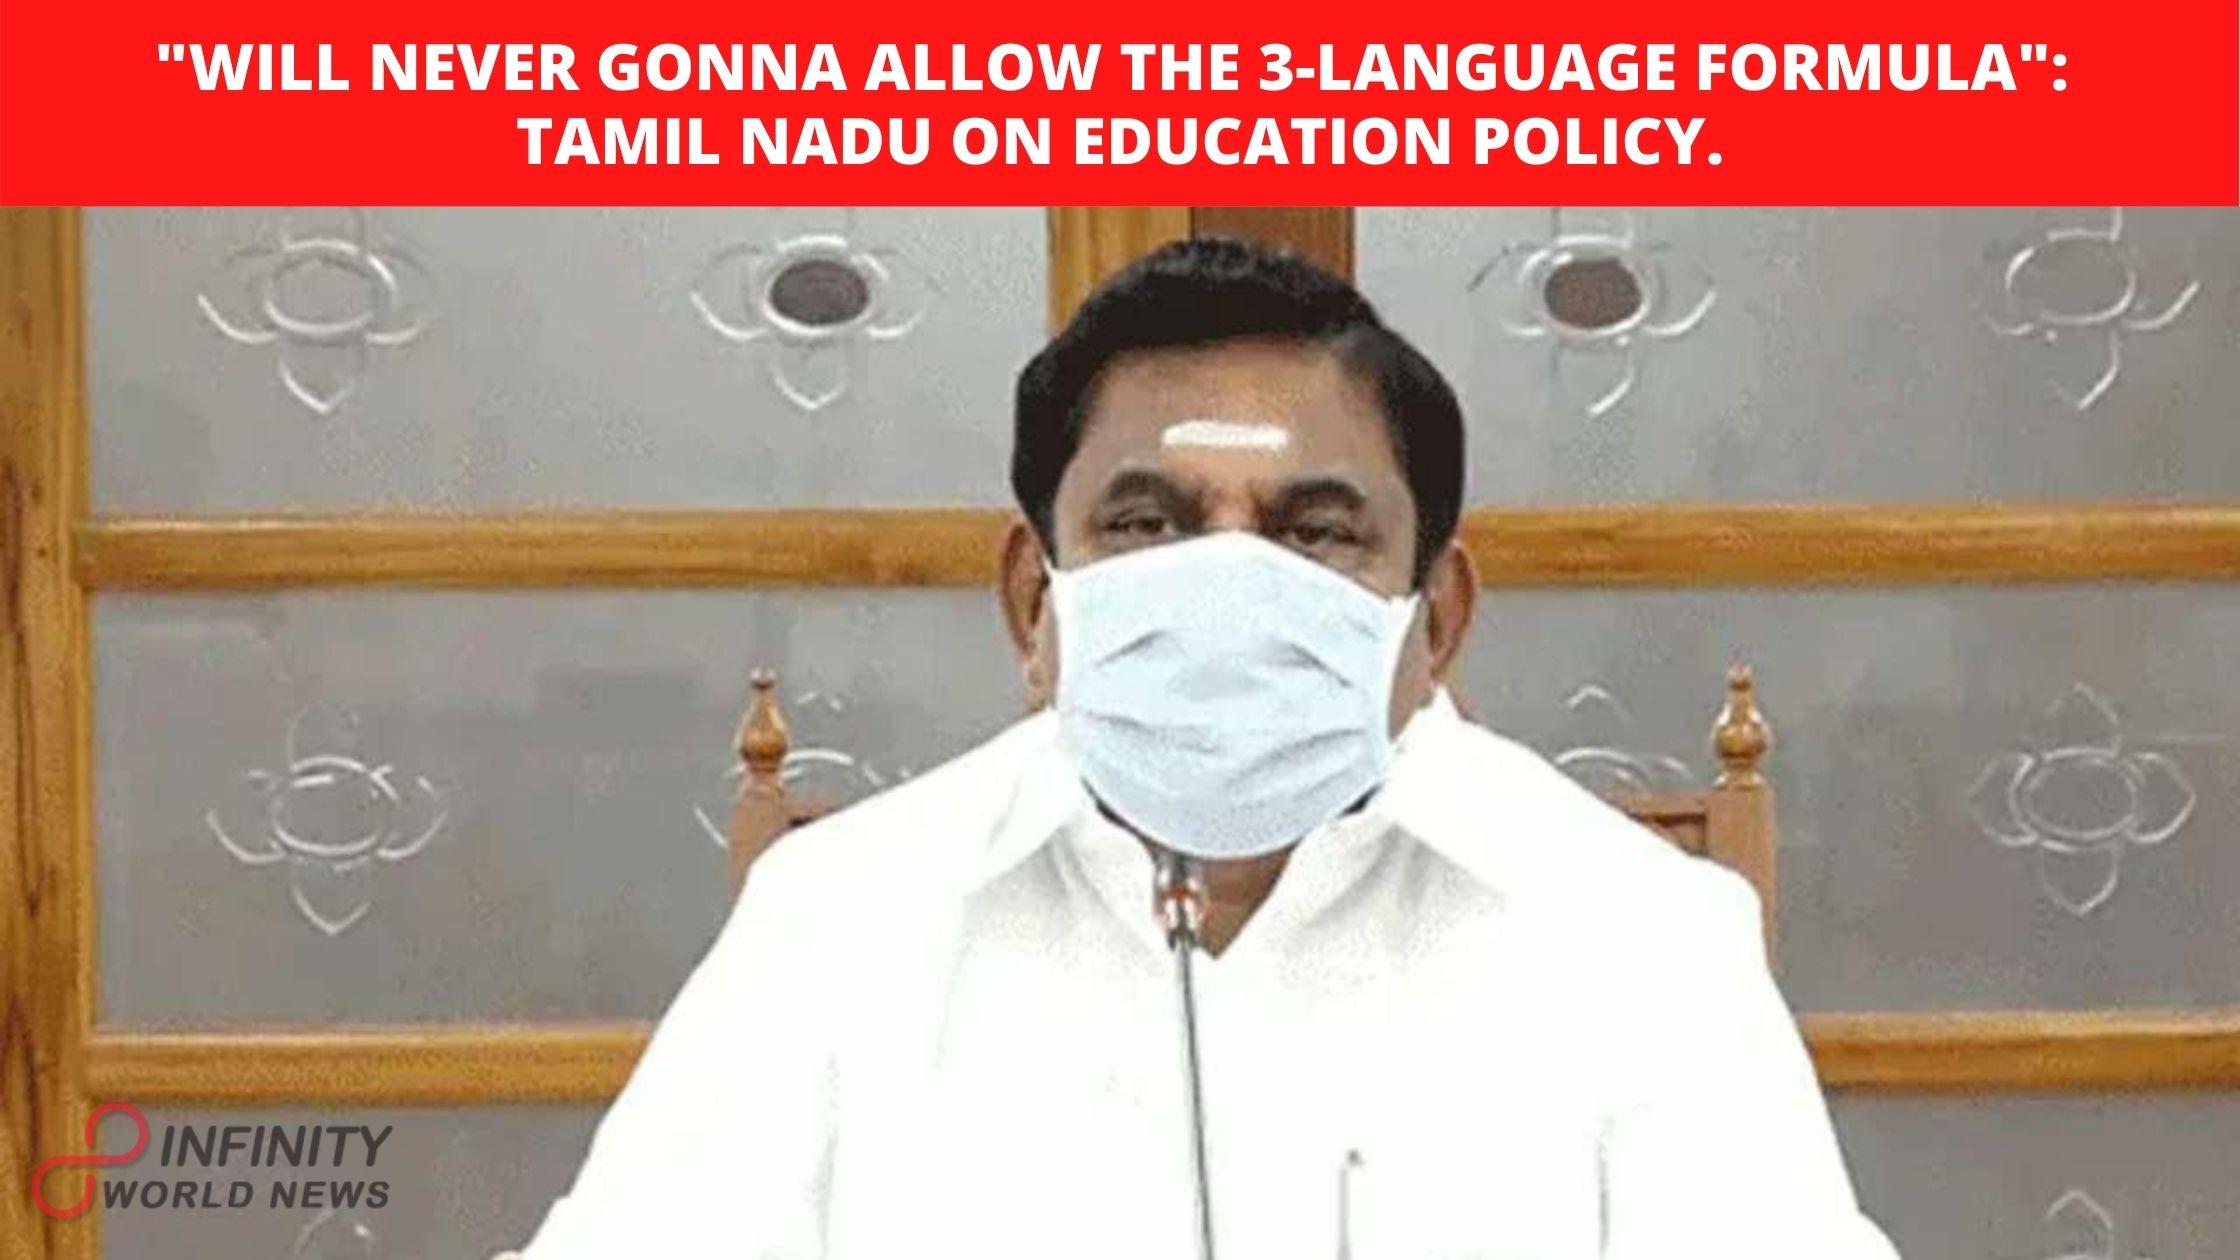 Tamil Nadu On Education Policy